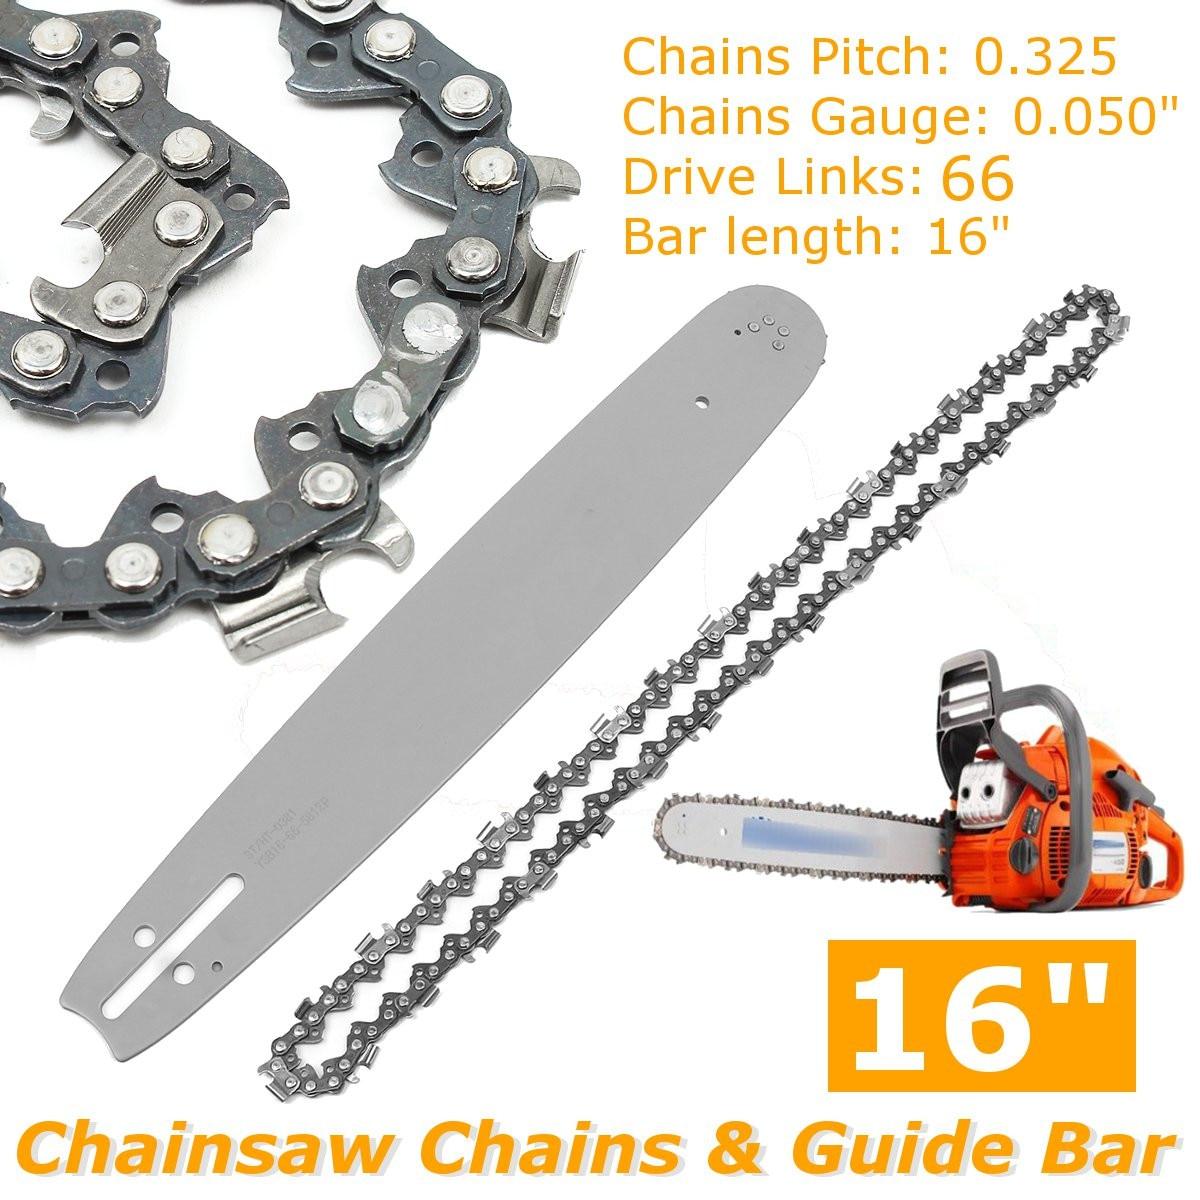 2Pcs 16 inch Guide Bar + Chainsaw Chains Semi Chisel Chain For Husqvarna 36 41 50 51 55  346XP 450 455 460 POULAN 66DL